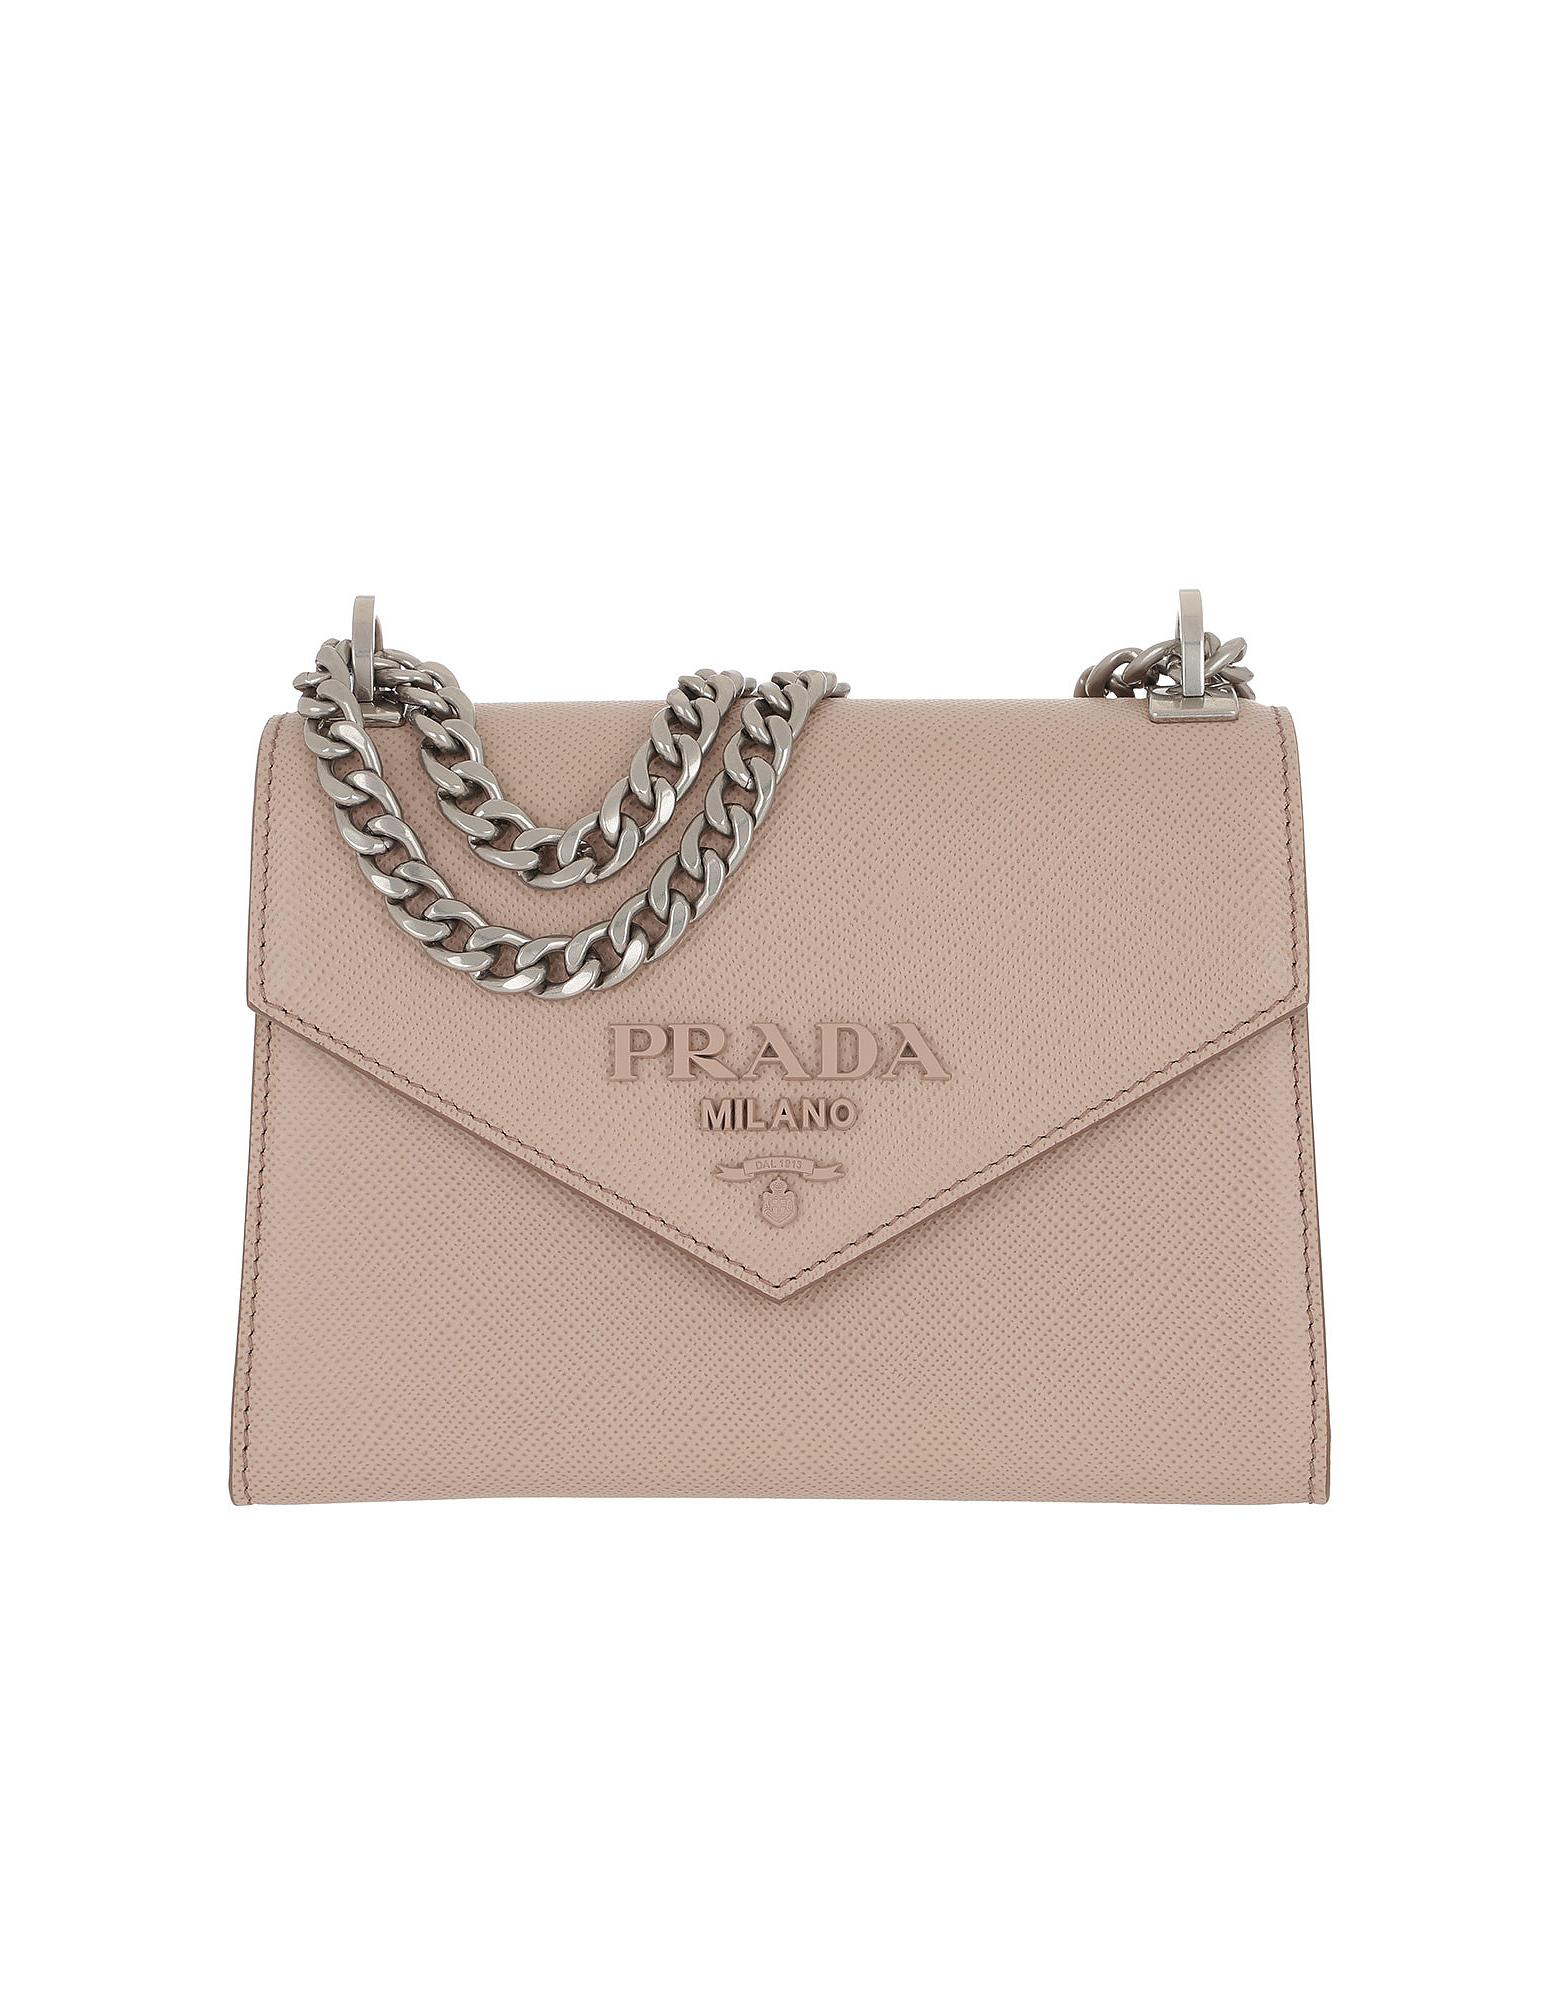 b9342d4eef8bb2 Prada Monochrome Crossbody Bag Medium Cipria In Light Pink | ModeSens